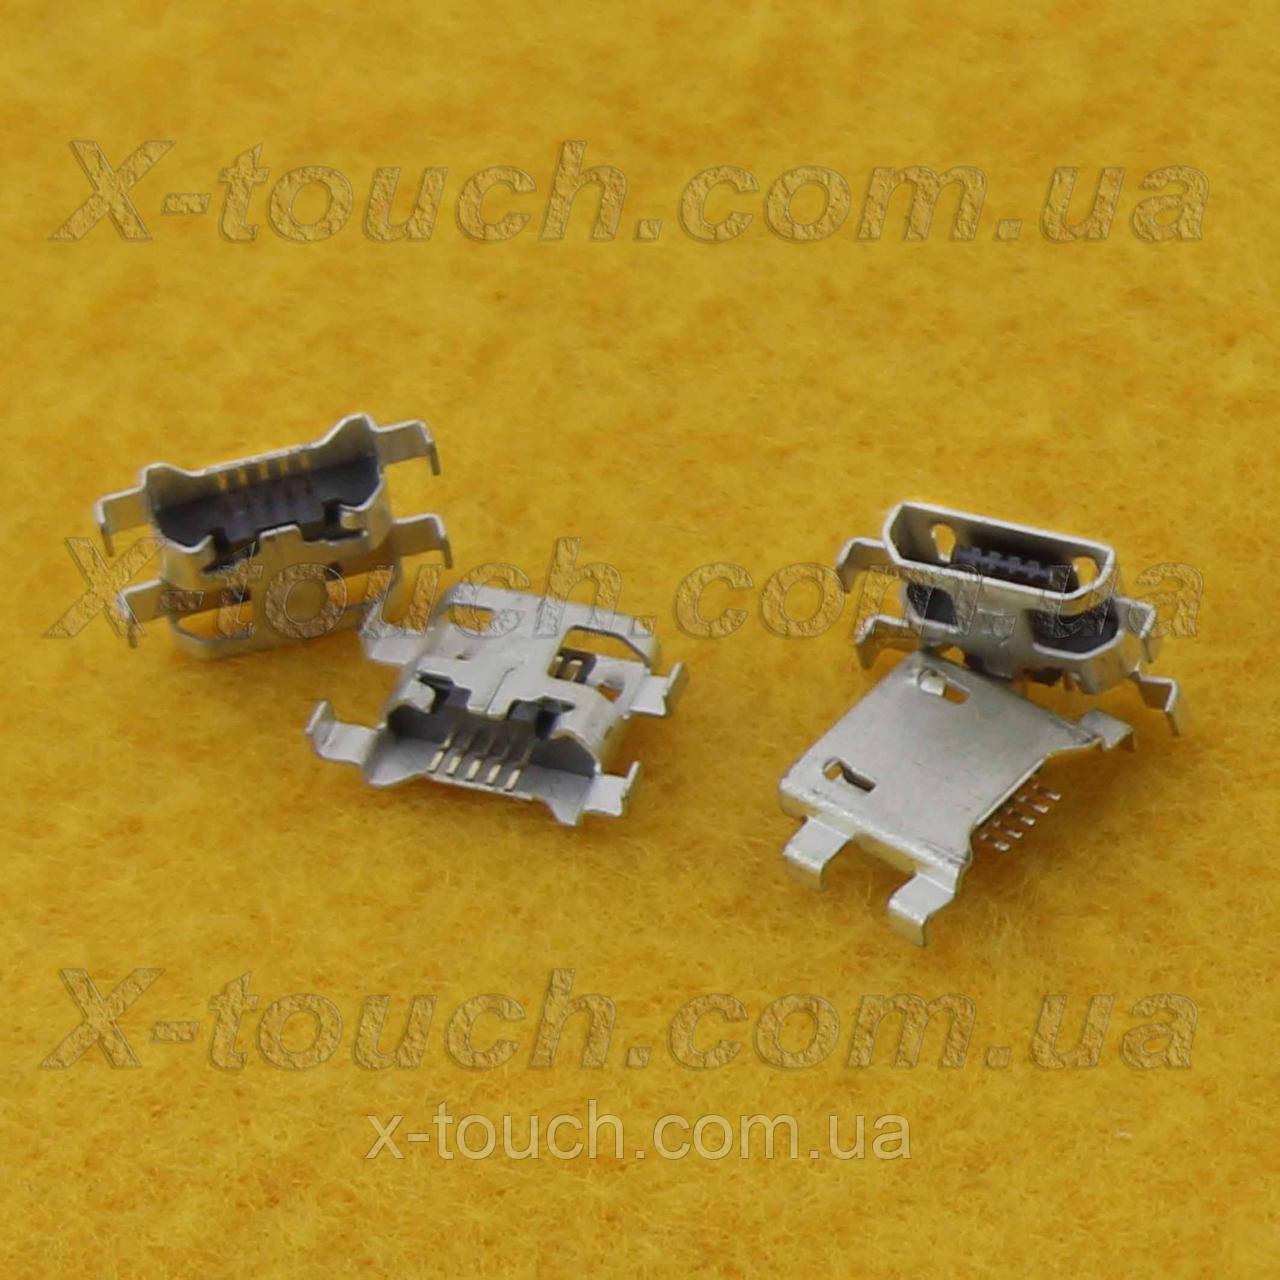 Huawei Honor 2 U9508 разъем зарядки  micro-B USB 5pin.